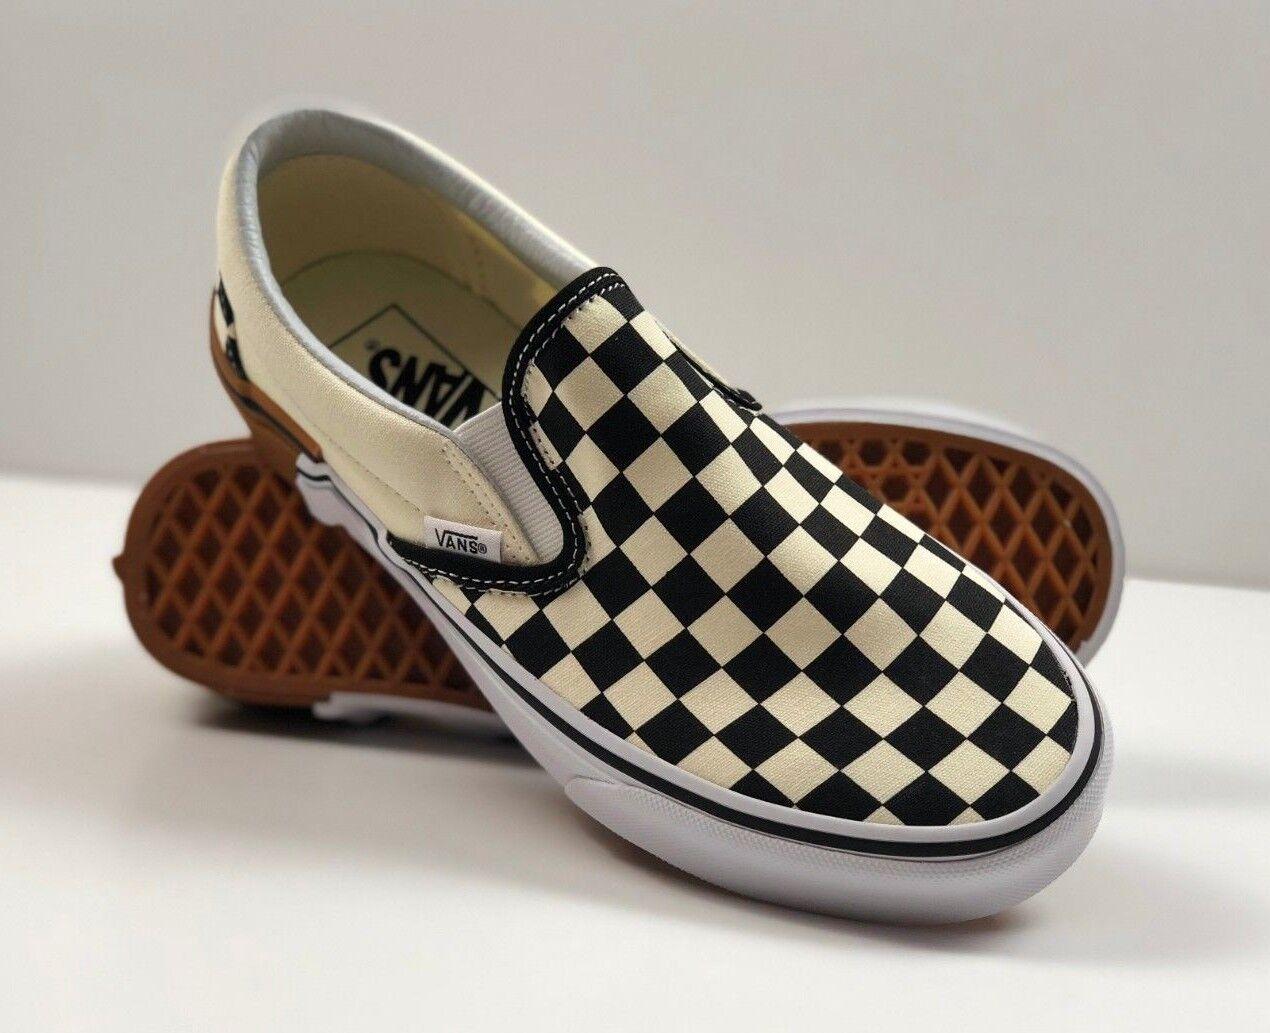 VANS Classic Slip-on Gum Block Checkerboard Black White Sneakers VN0A38F7U58